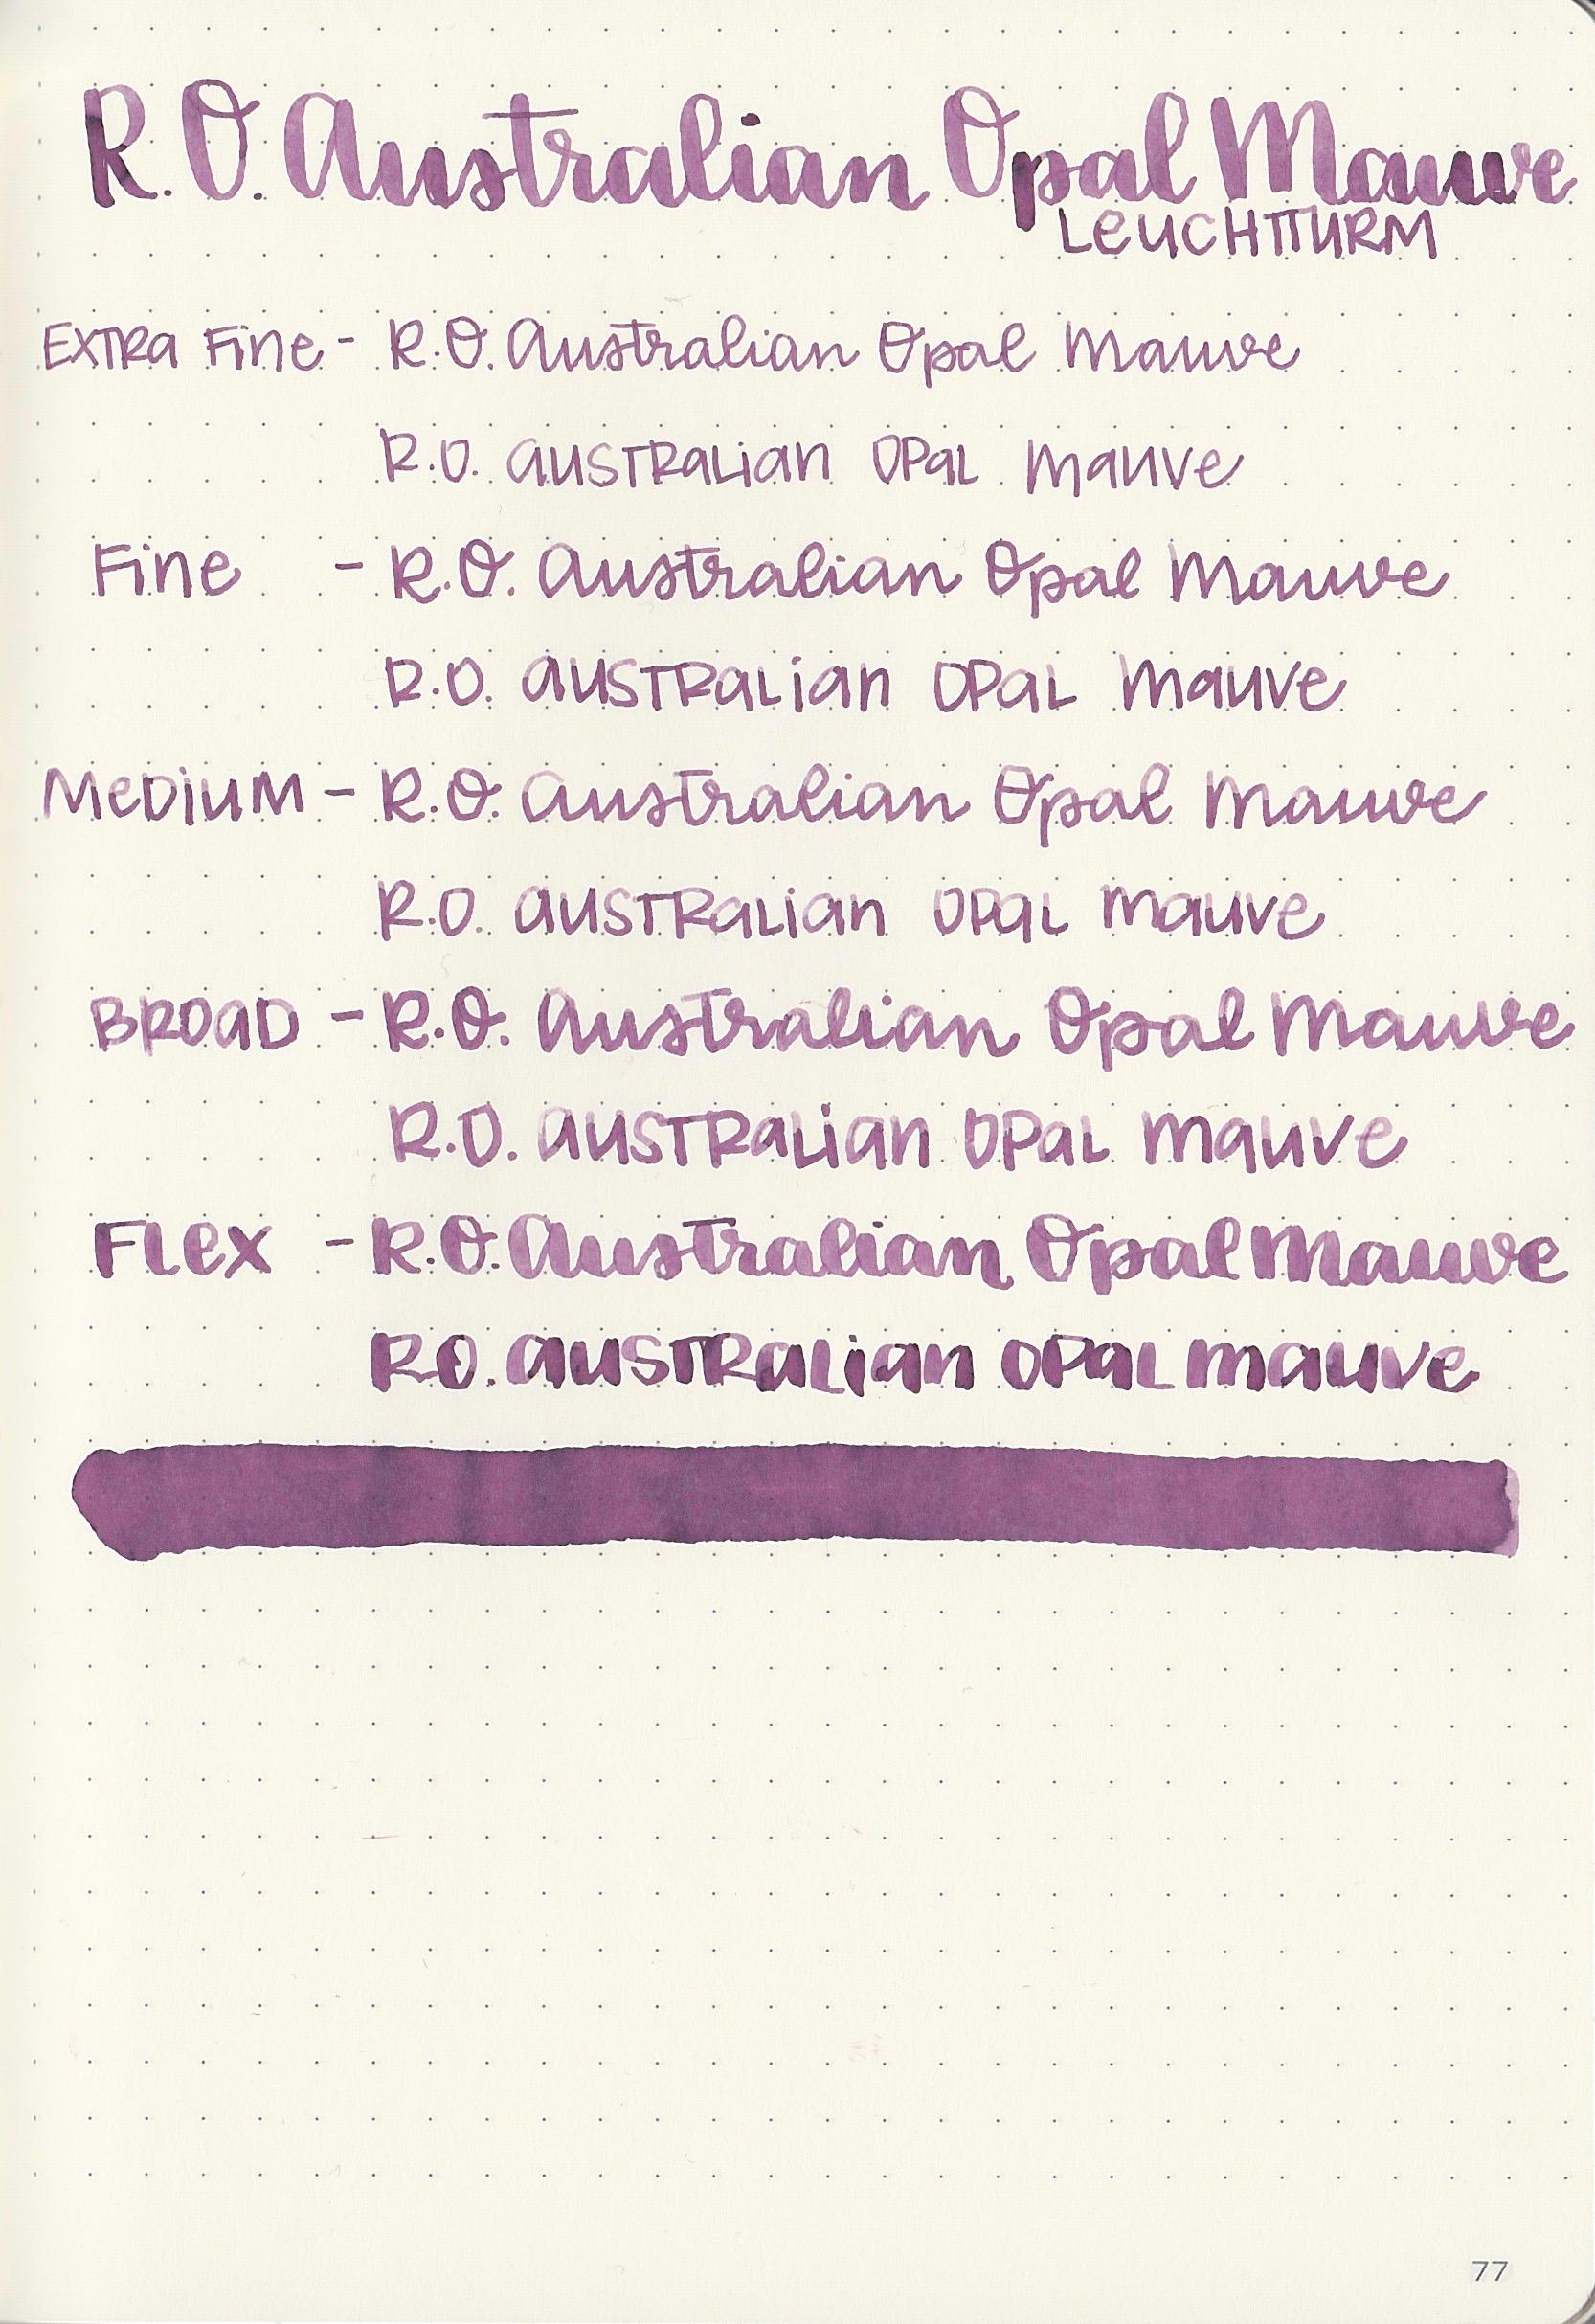 ROAustralianOpalMauve - 11.jpg